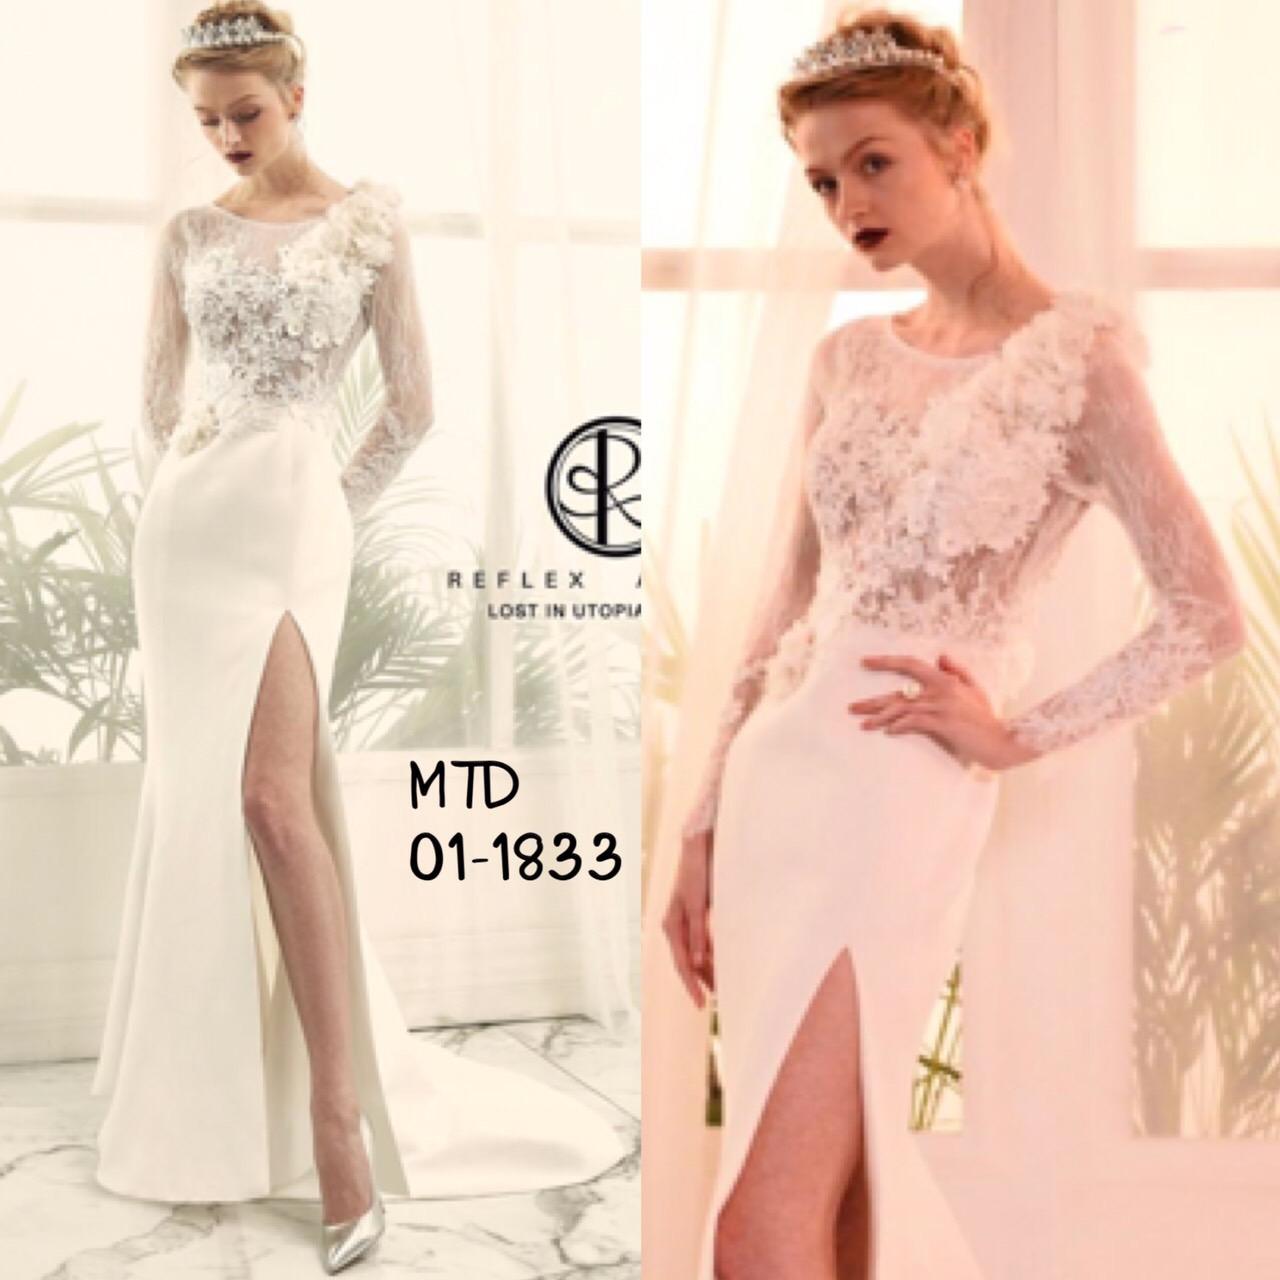 Brand : reflex angela ชื่อรุ่น : wedding dress